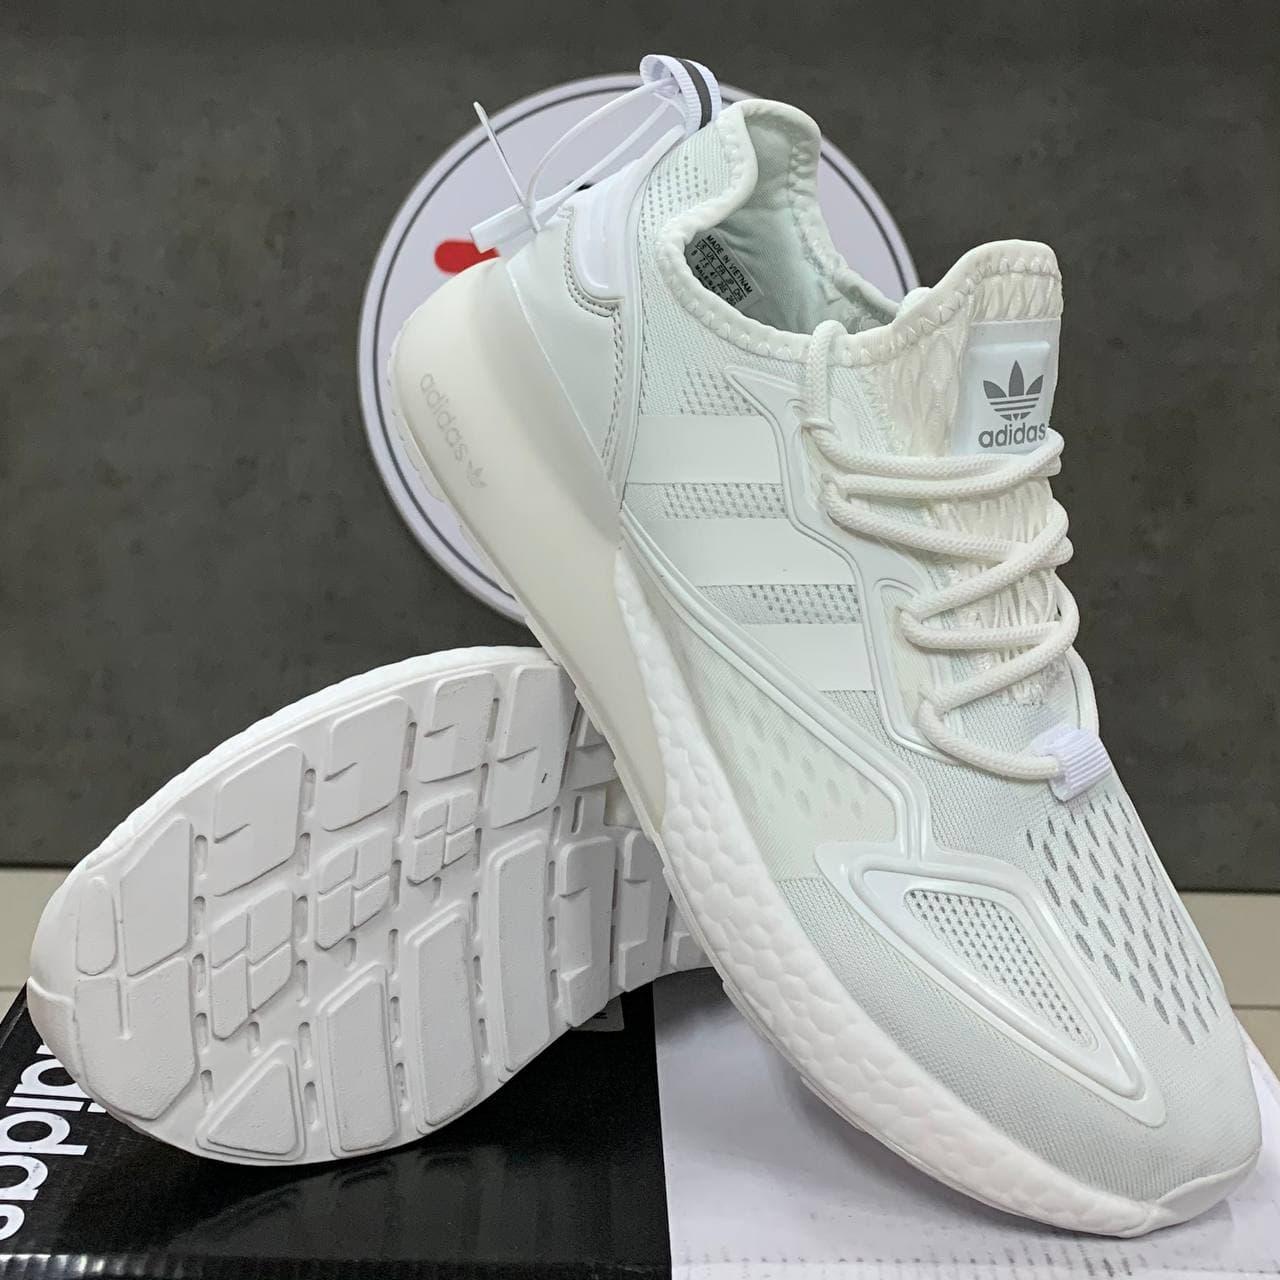 Кроссовки Adidas ZX 2K Boost - фото 1